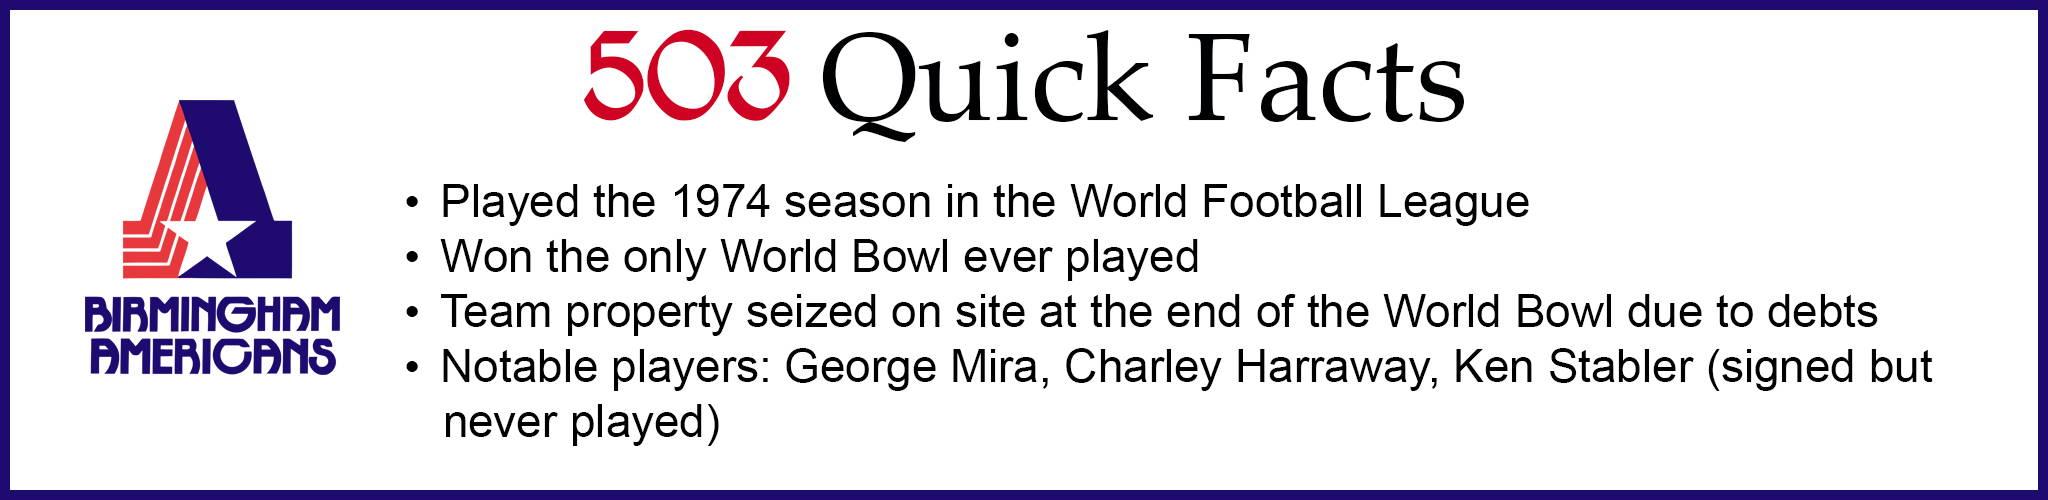 Birmingham Americans George Mira Charley Harraway, Ken Stabler World Bowl